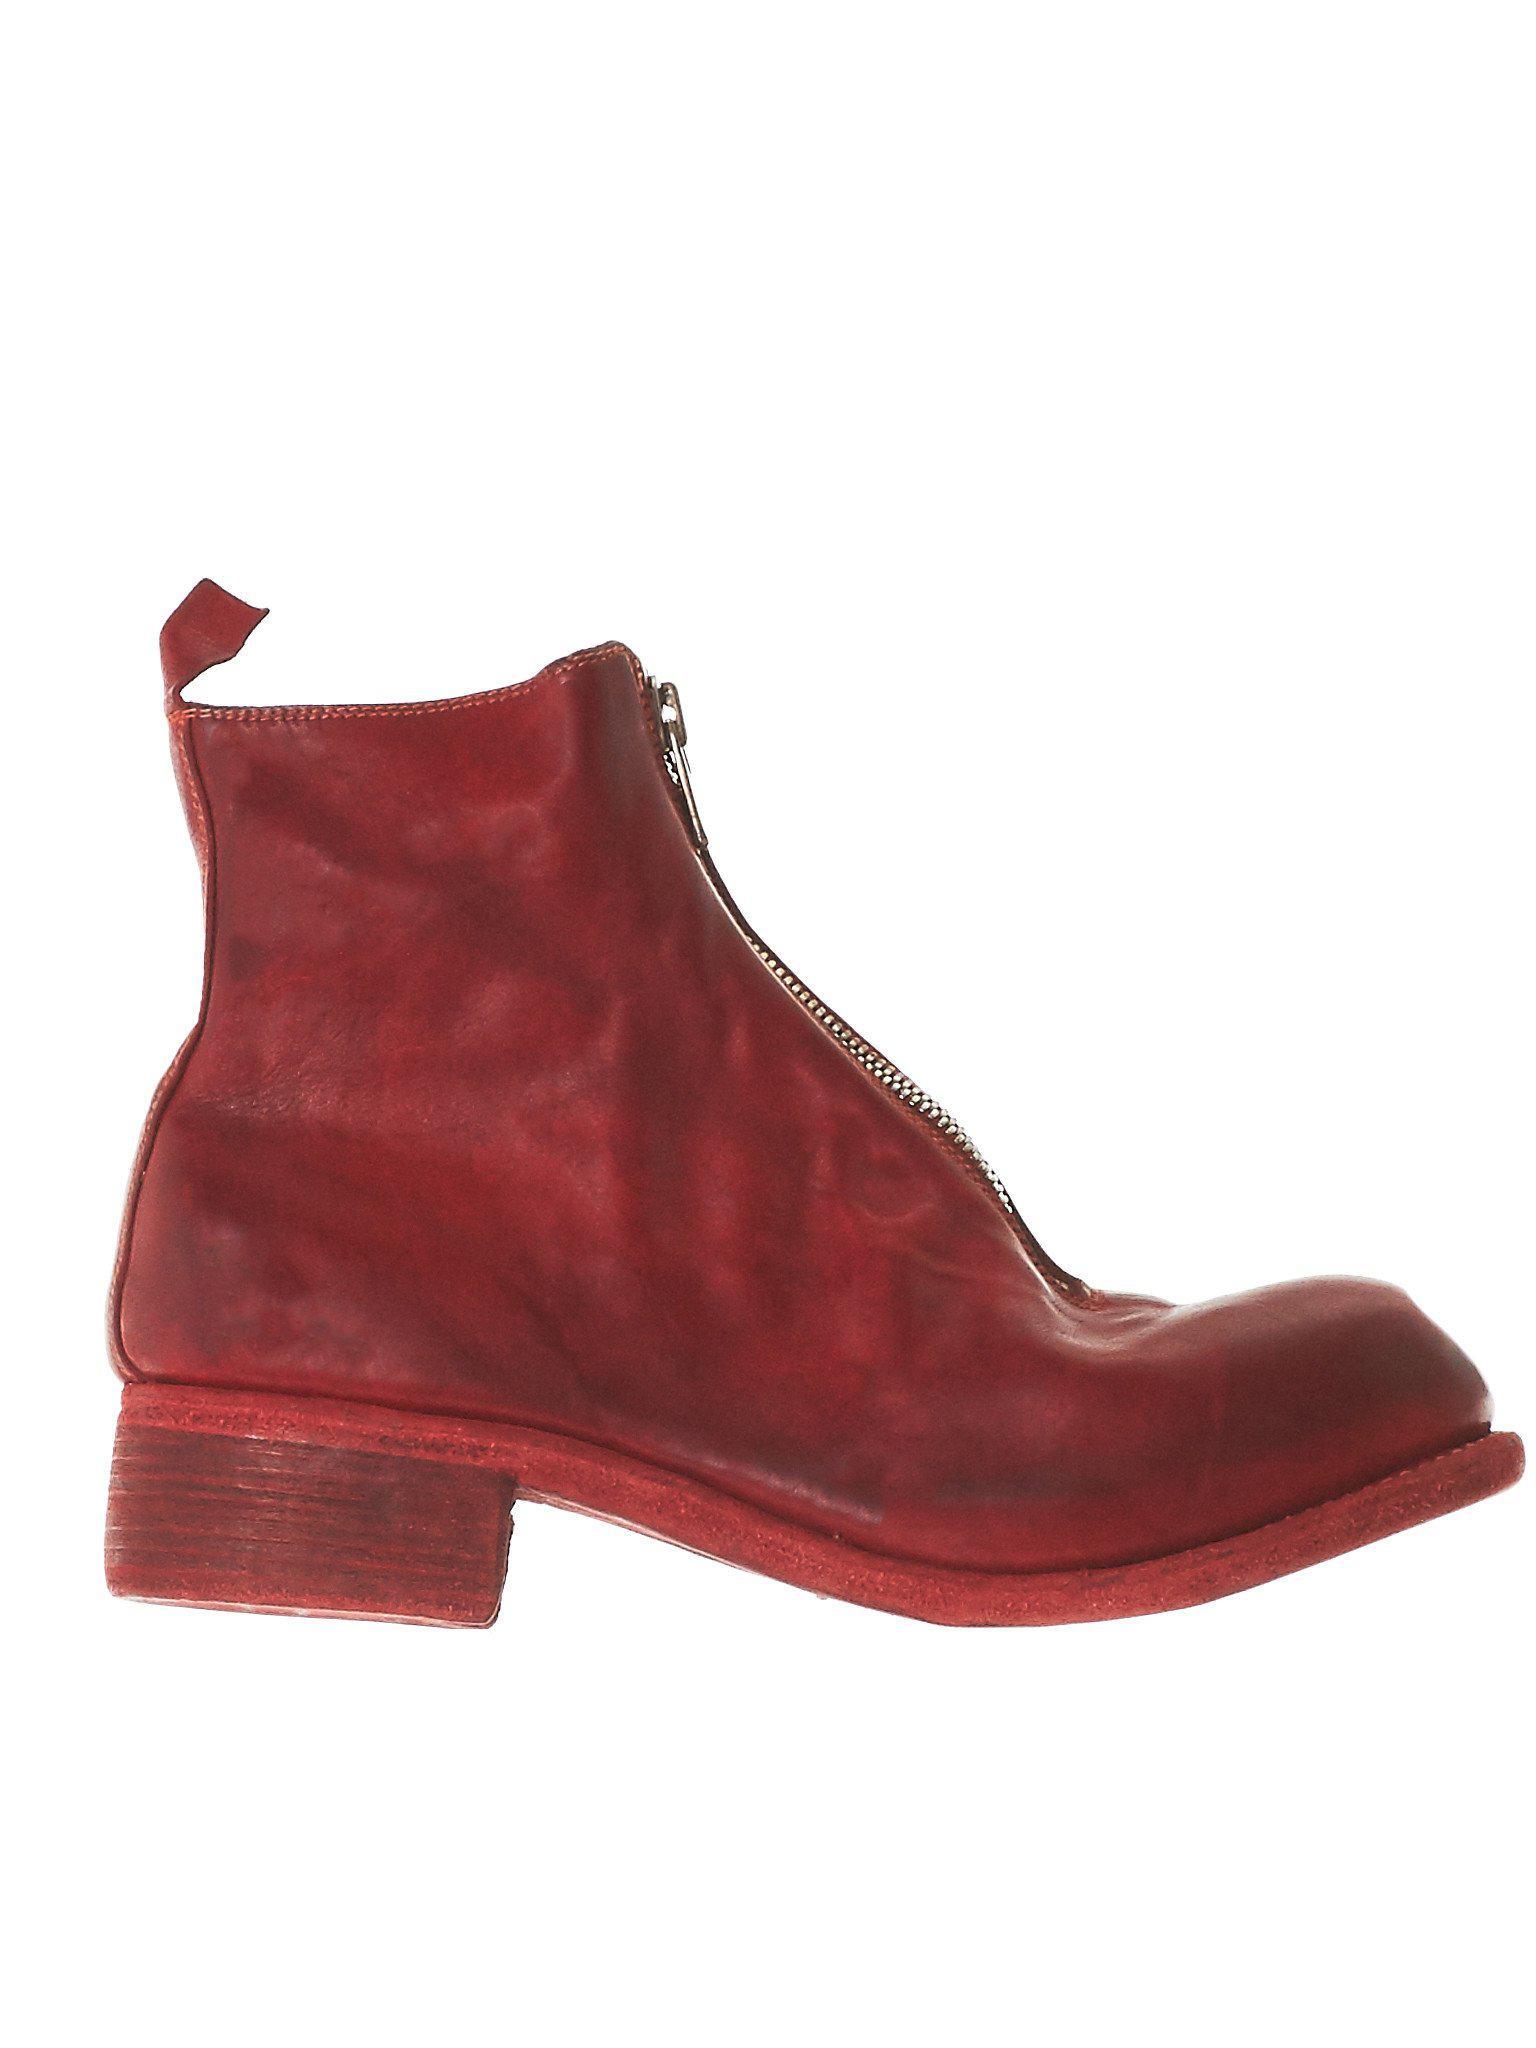 Guidi block heel zip front boots fake free shipping huge surprise yiZCKES